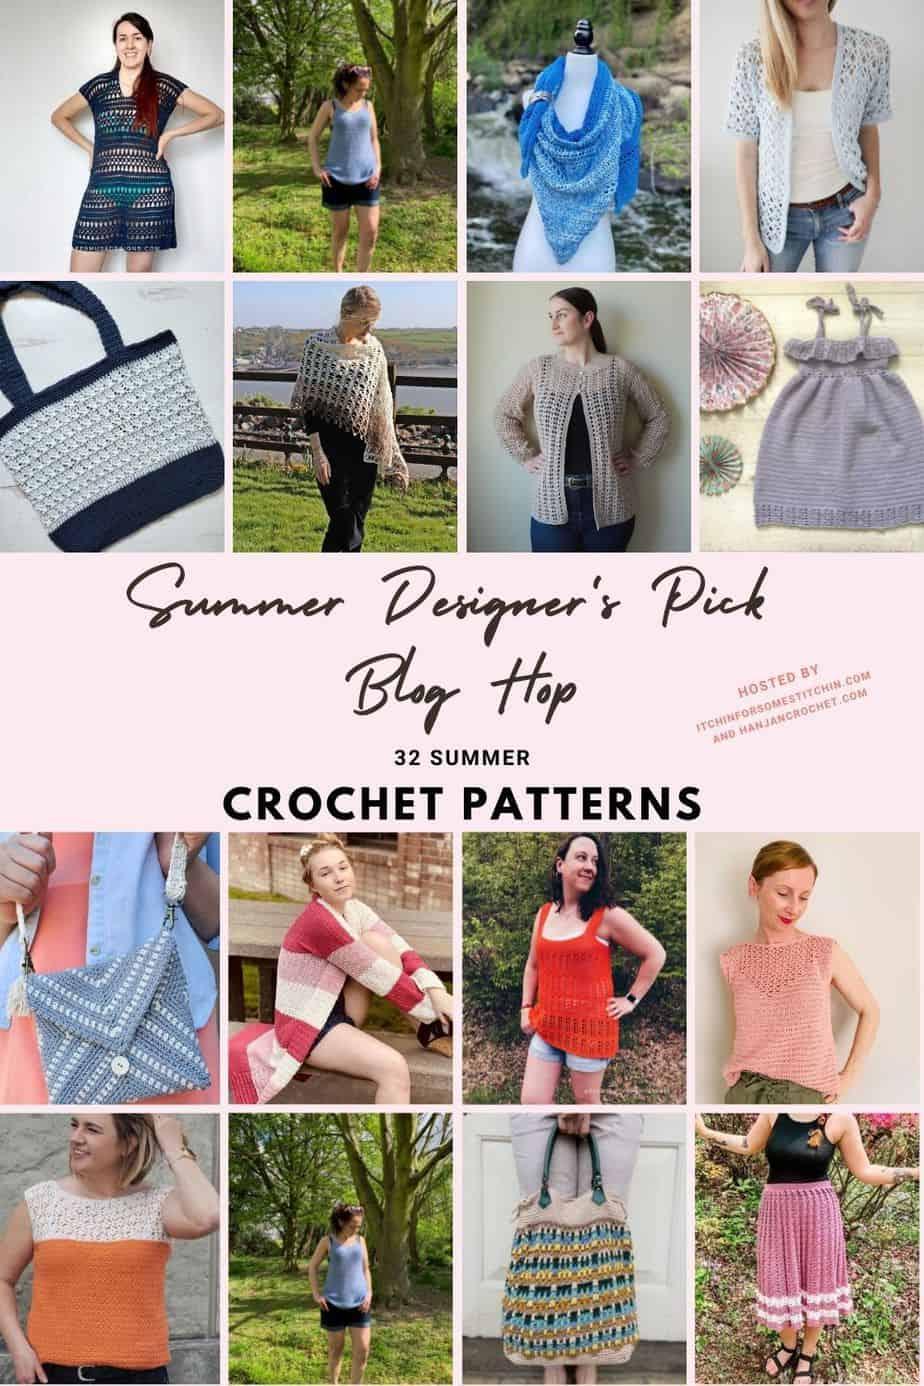 32 summer crochet patterns designer's pick blog hop